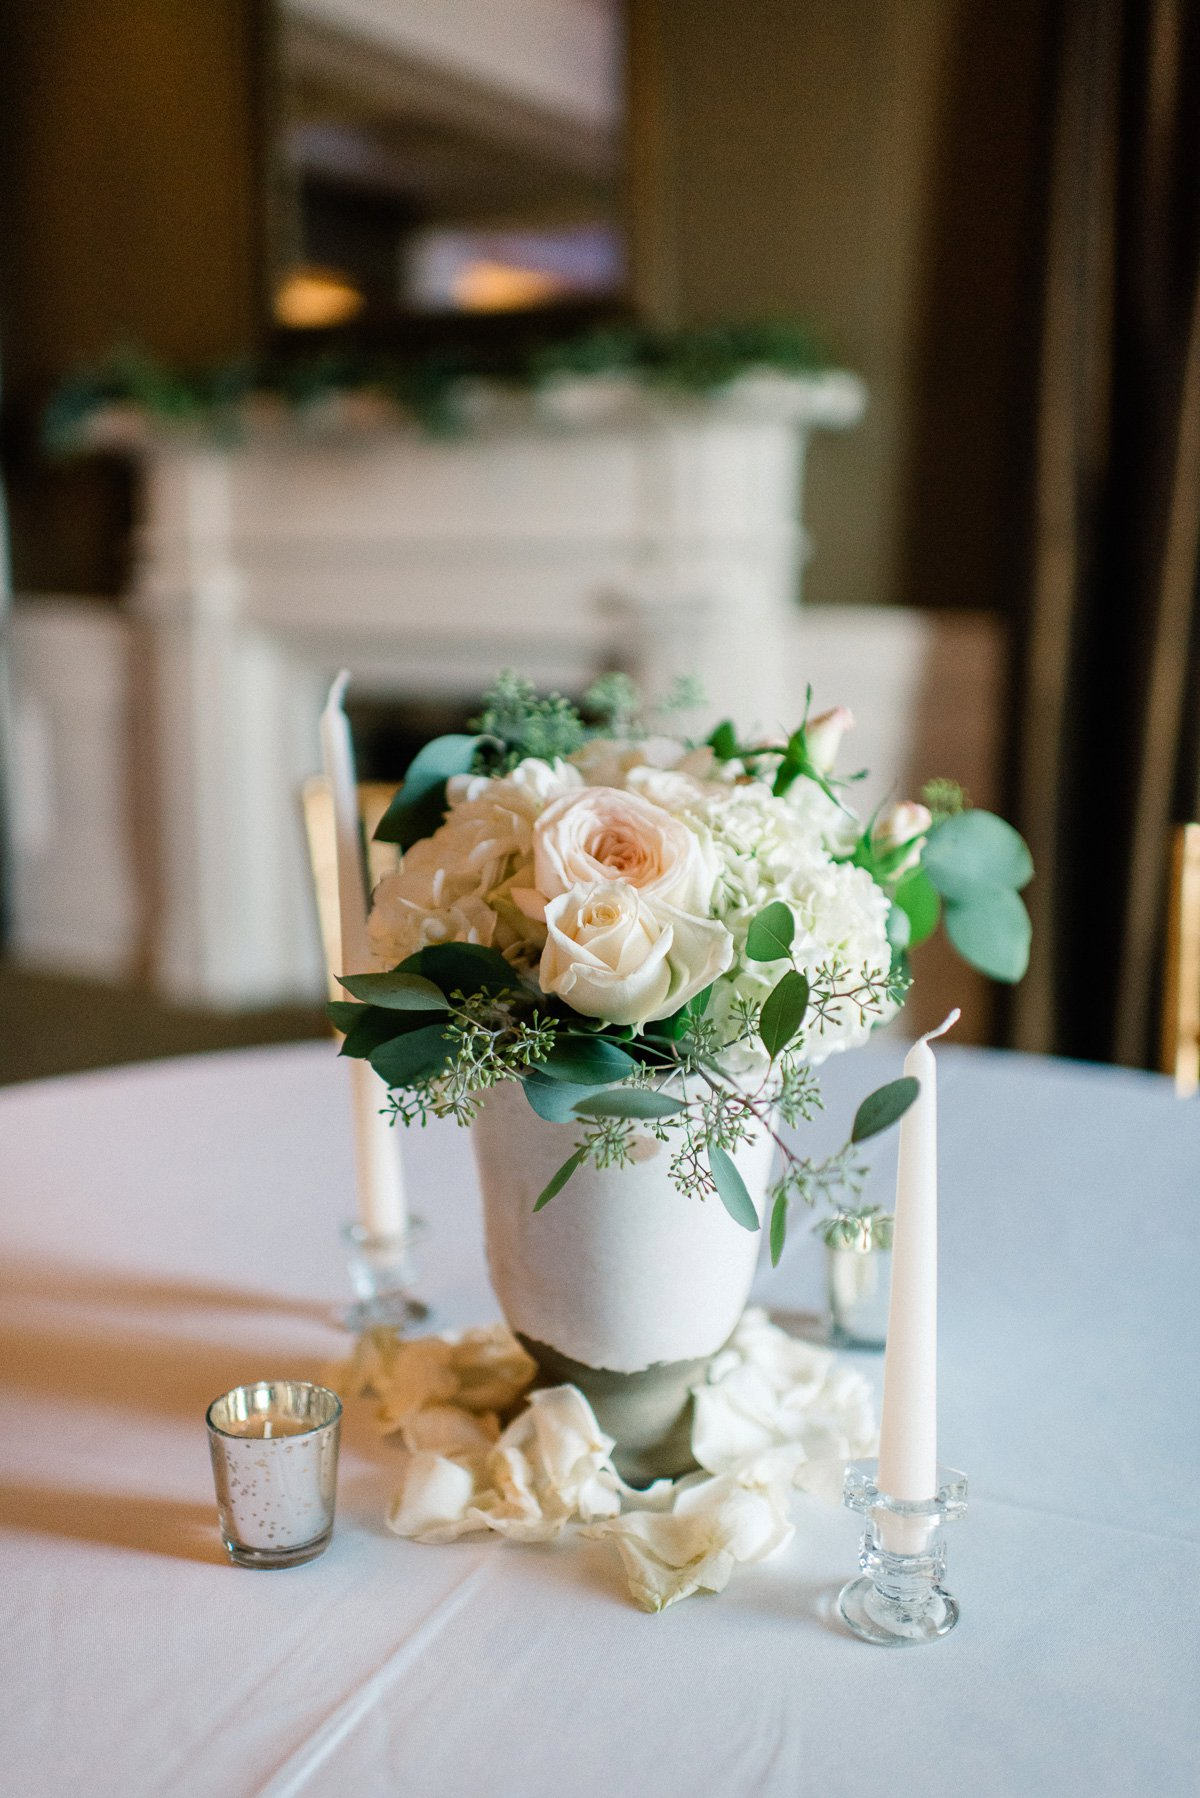 wedding florals by victoria austin designs, biloxi mississippi wedding photography